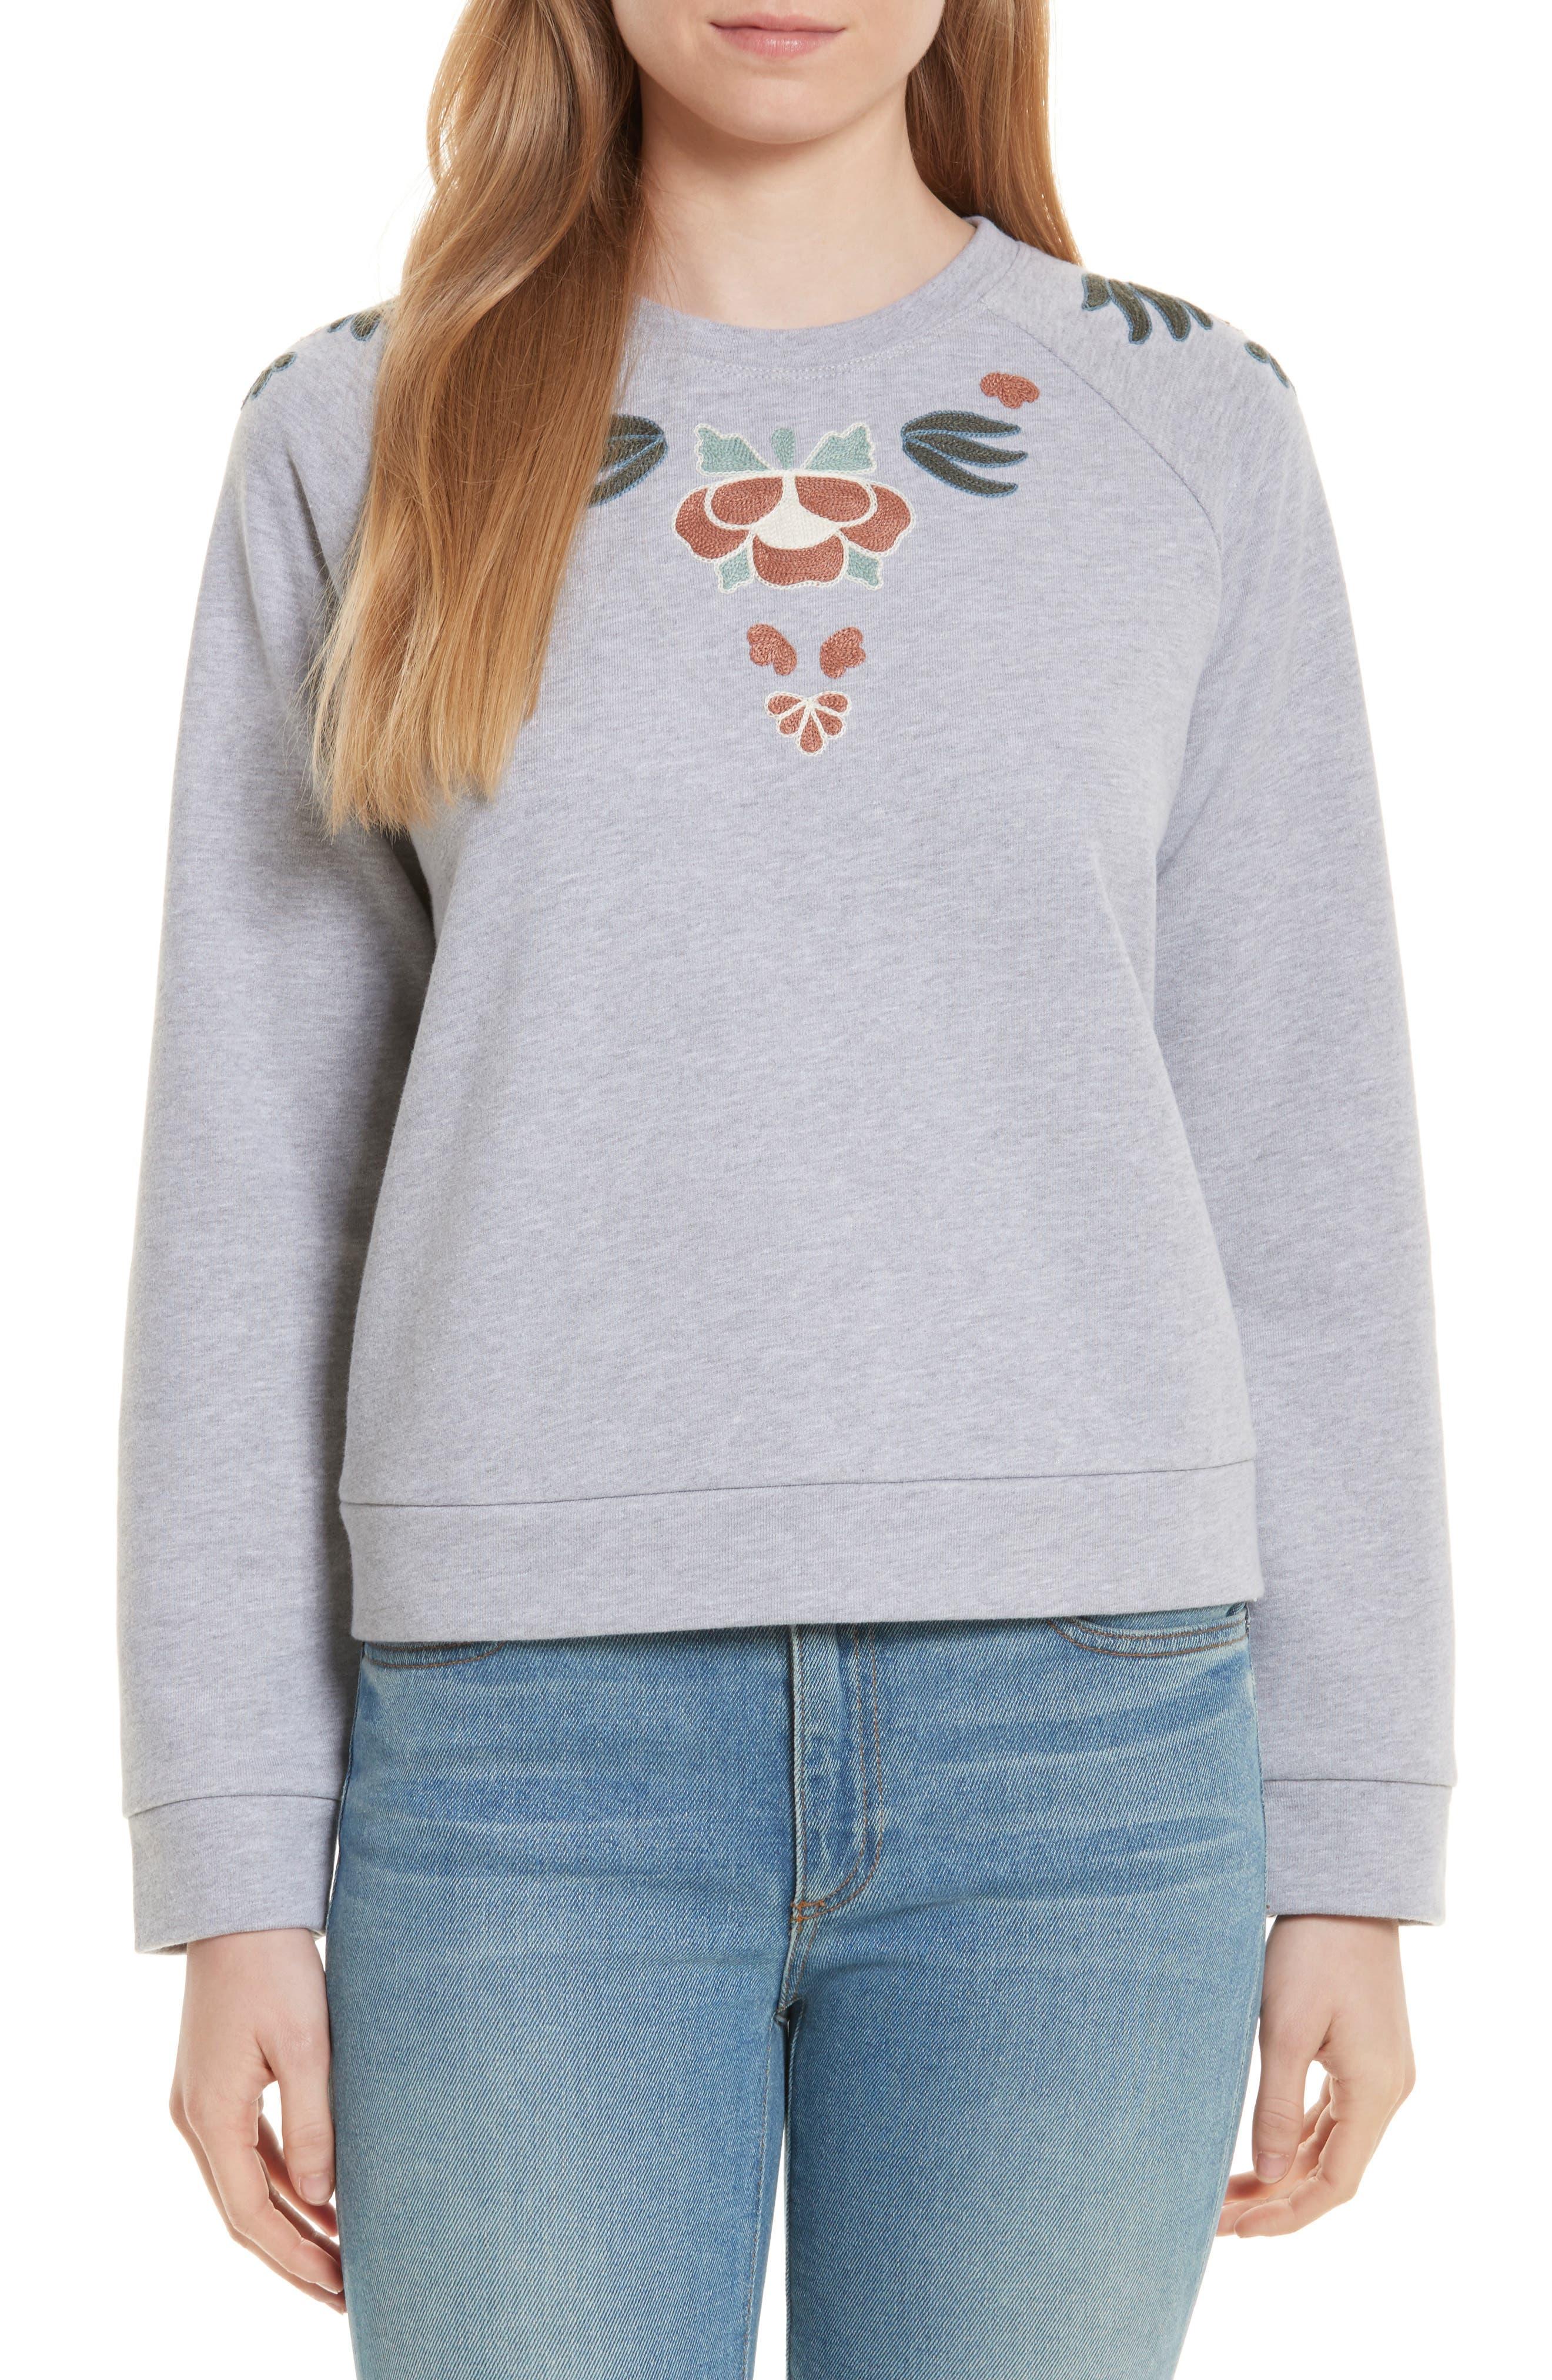 Jennings Embroidered Sweatshirt,                             Main thumbnail 1, color,                             021